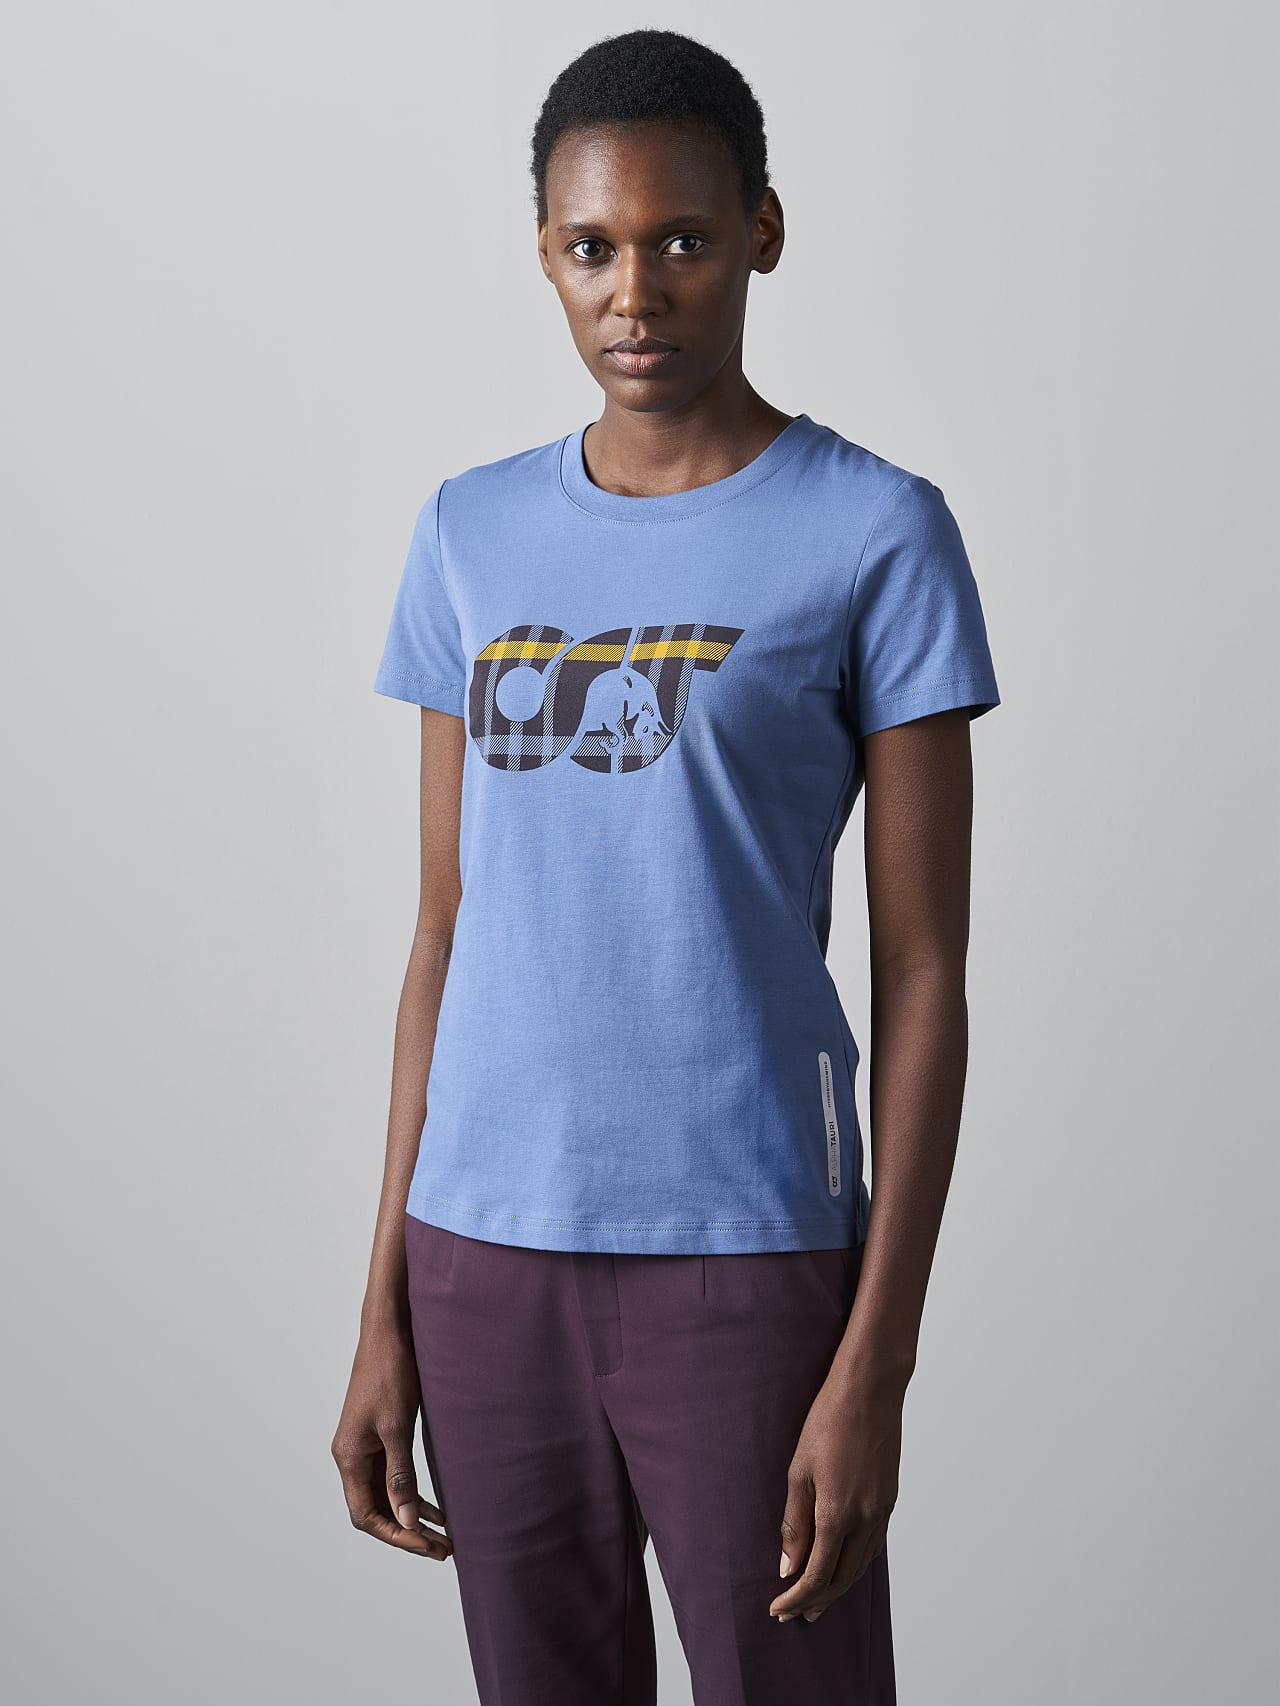 JANPA V1.Y5.02 Logo Print T-Shirt light blue Model shot Alpha Tauri